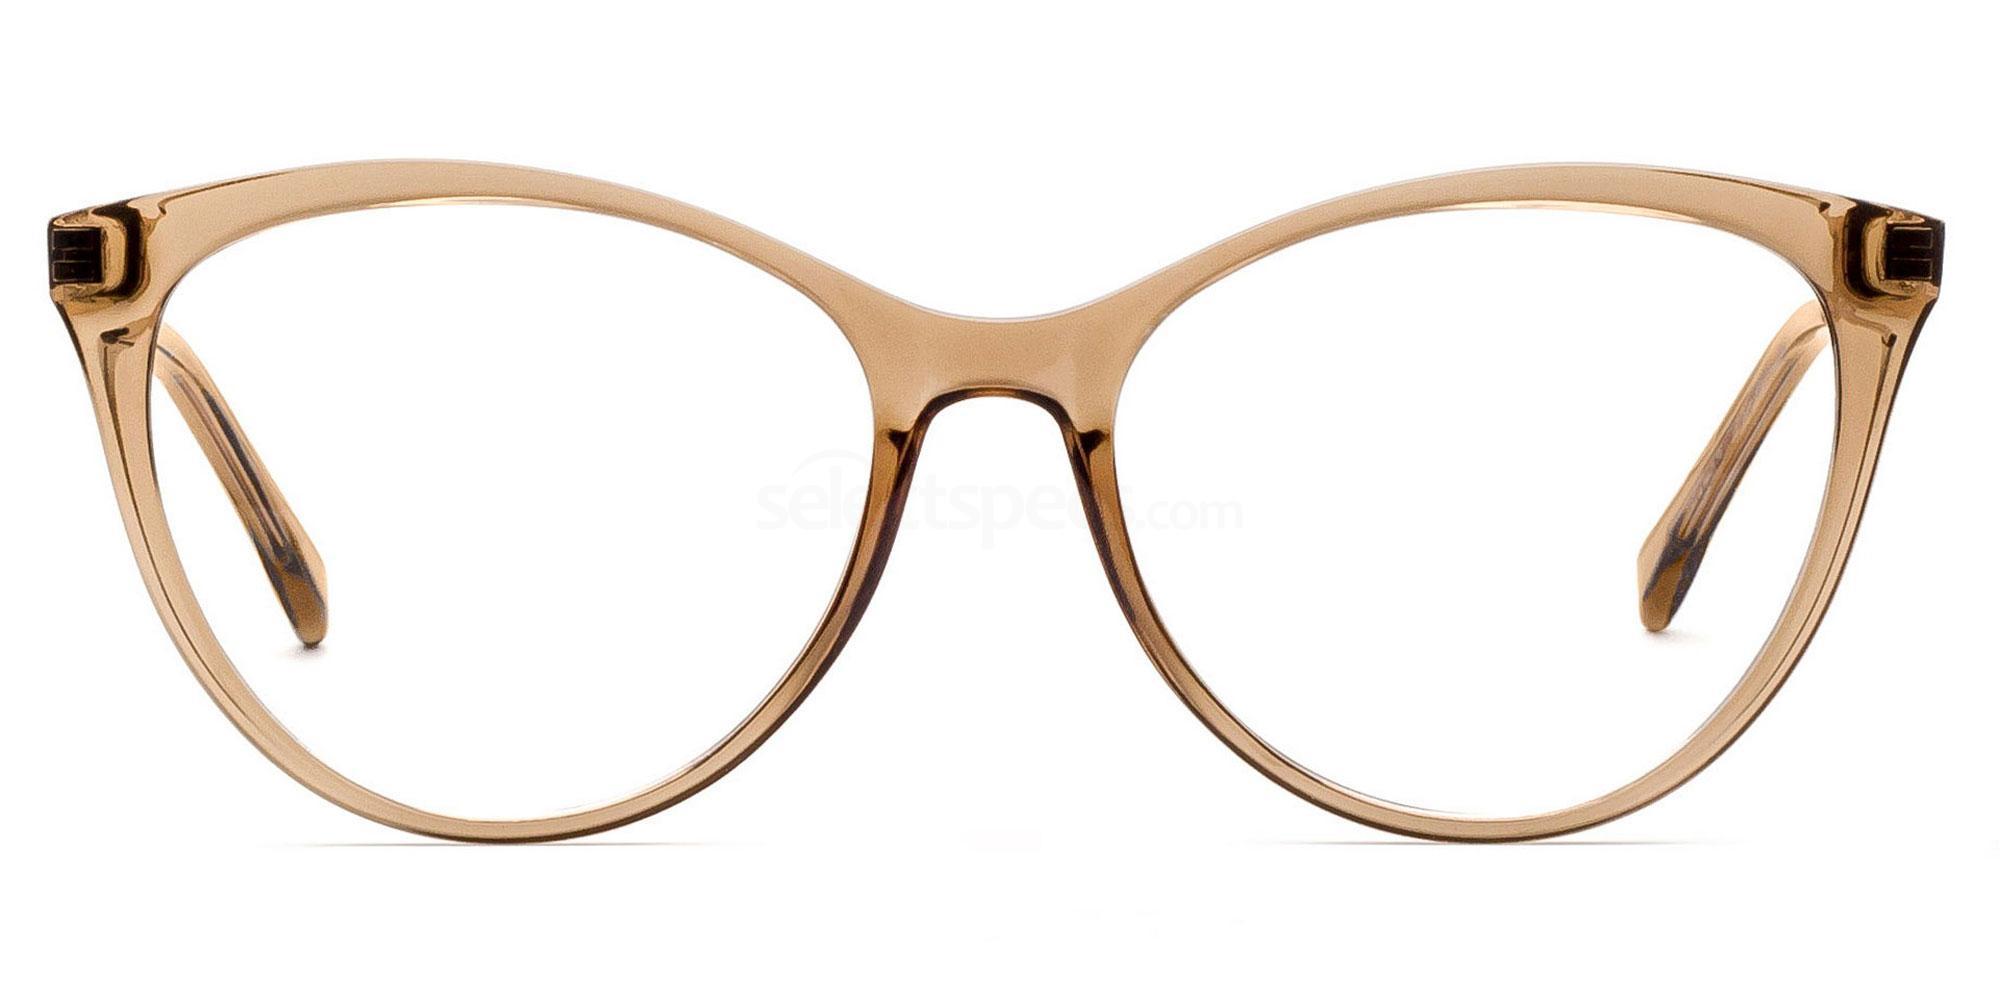 AW20 eyewear trends transparent glasses warm tones grey